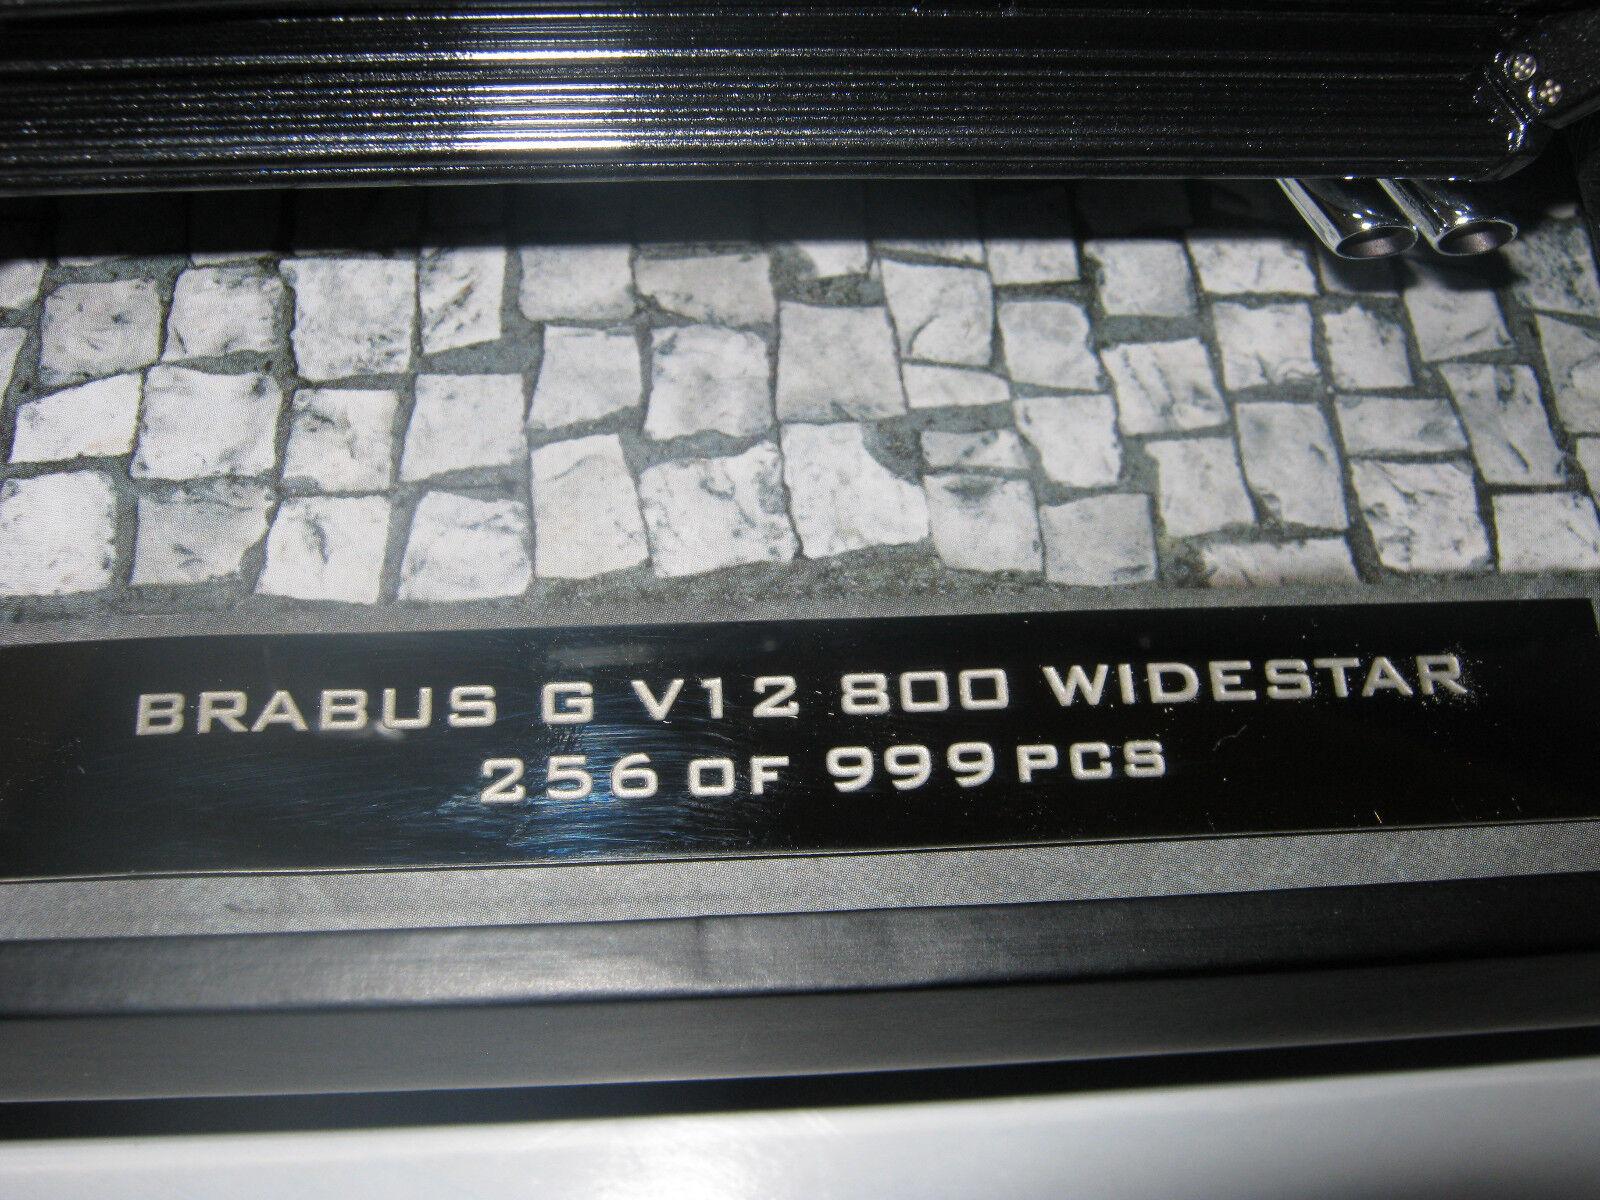 1:18 Brabus g v12 800 800 800 widestar Gris Minichamps 107032300 OVP nuevo 32be19